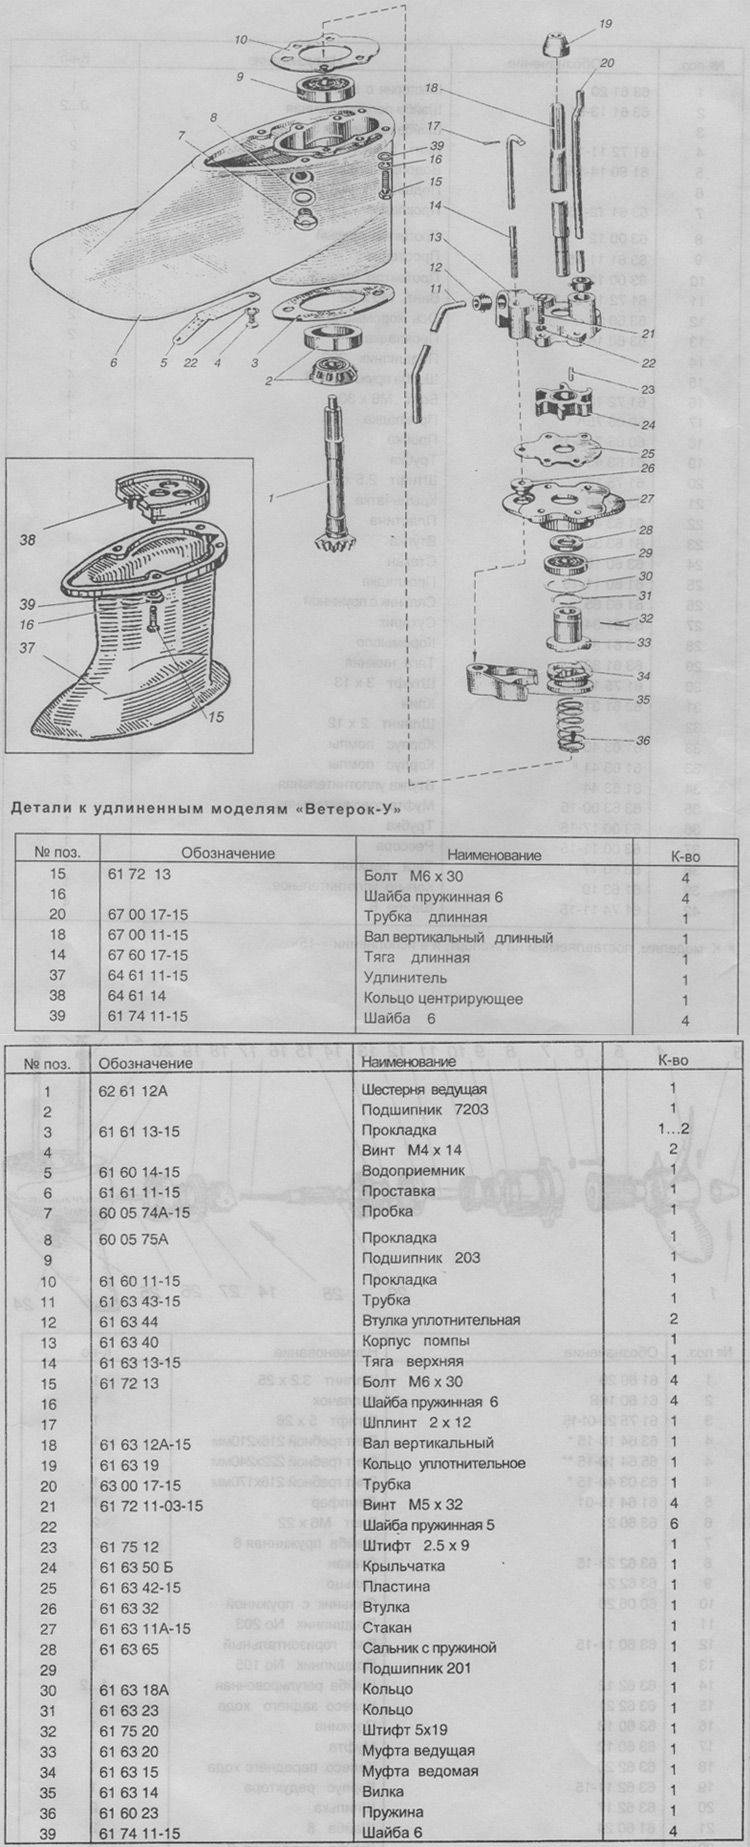 Ветерок-8 (лодочный мотор) » motorka.org